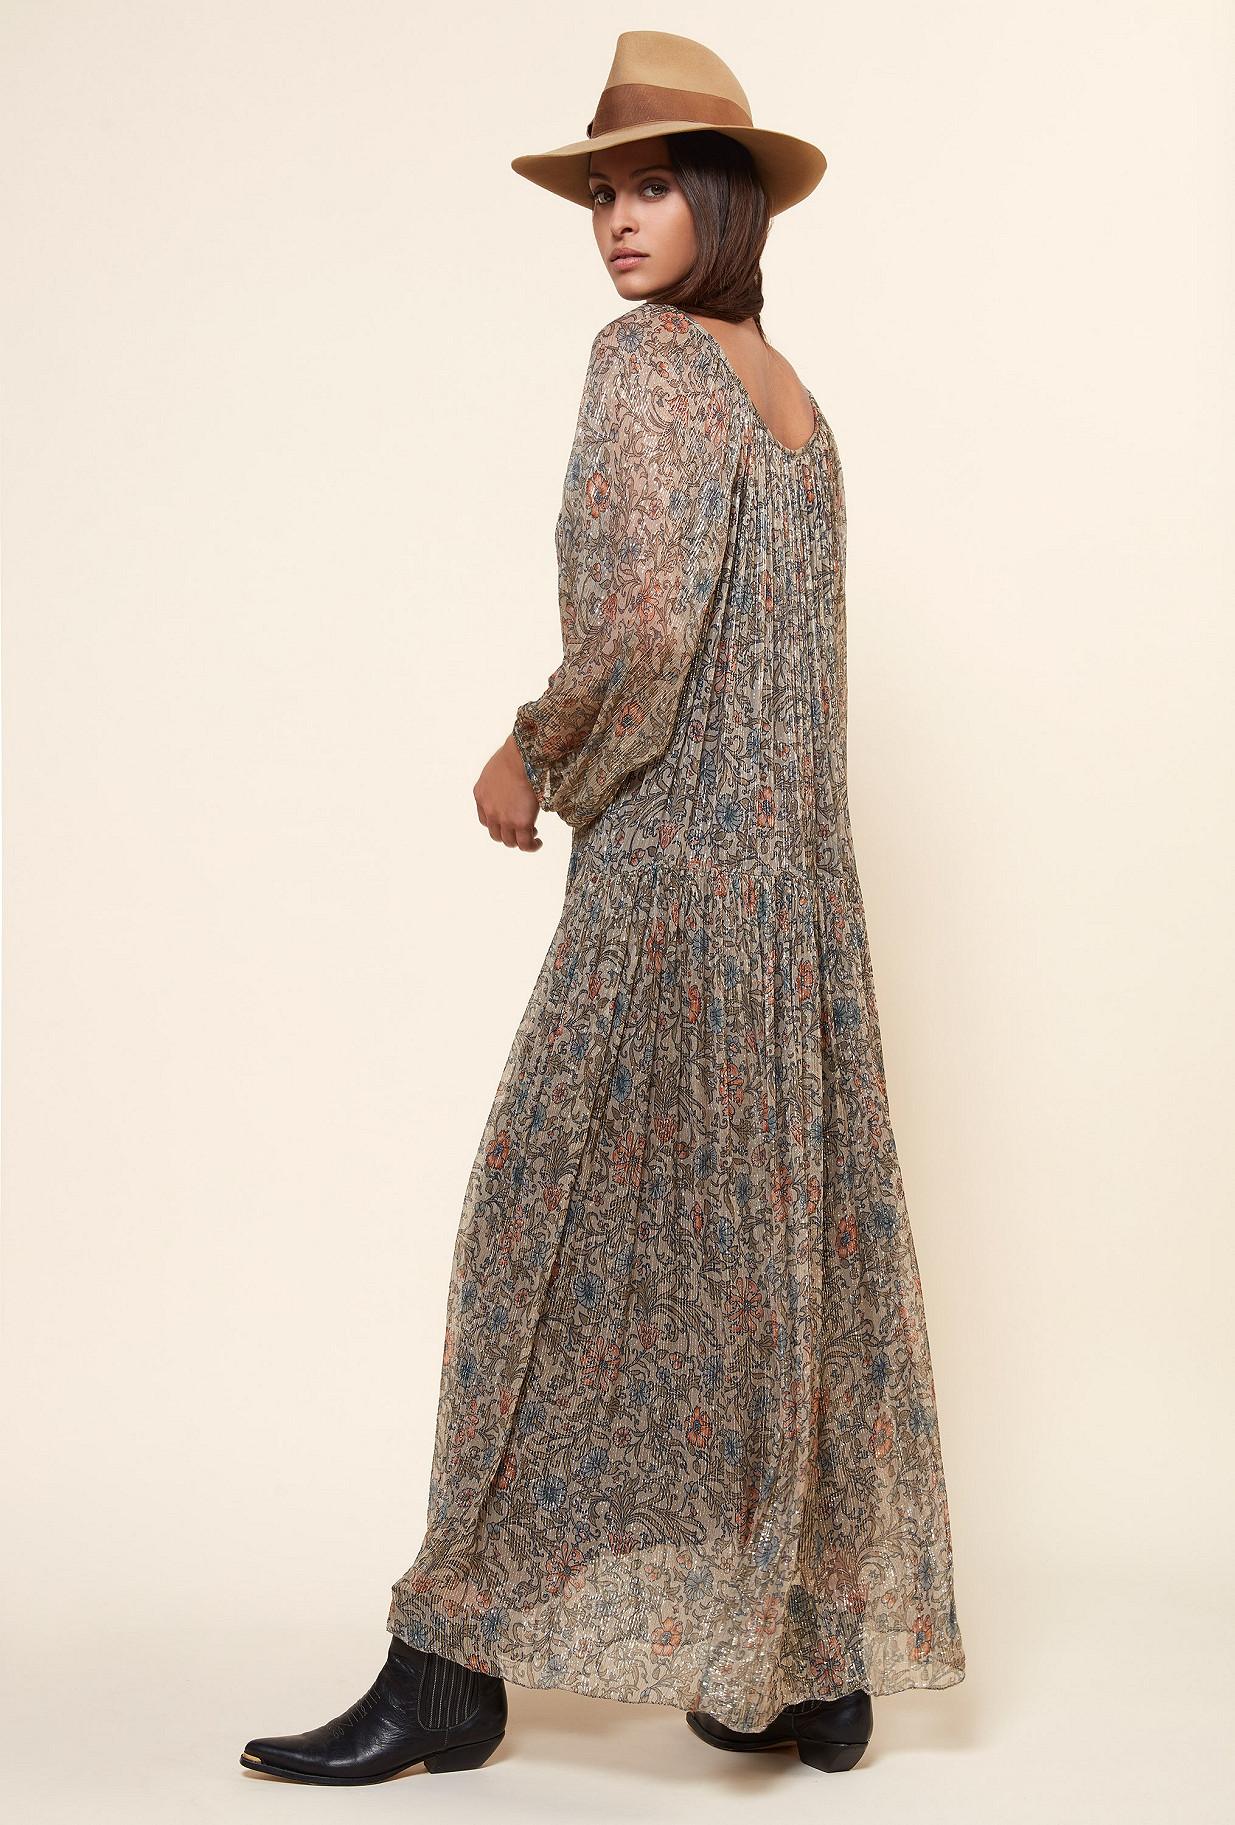 Floral print Dress Greta Mes Demoiselles Paris